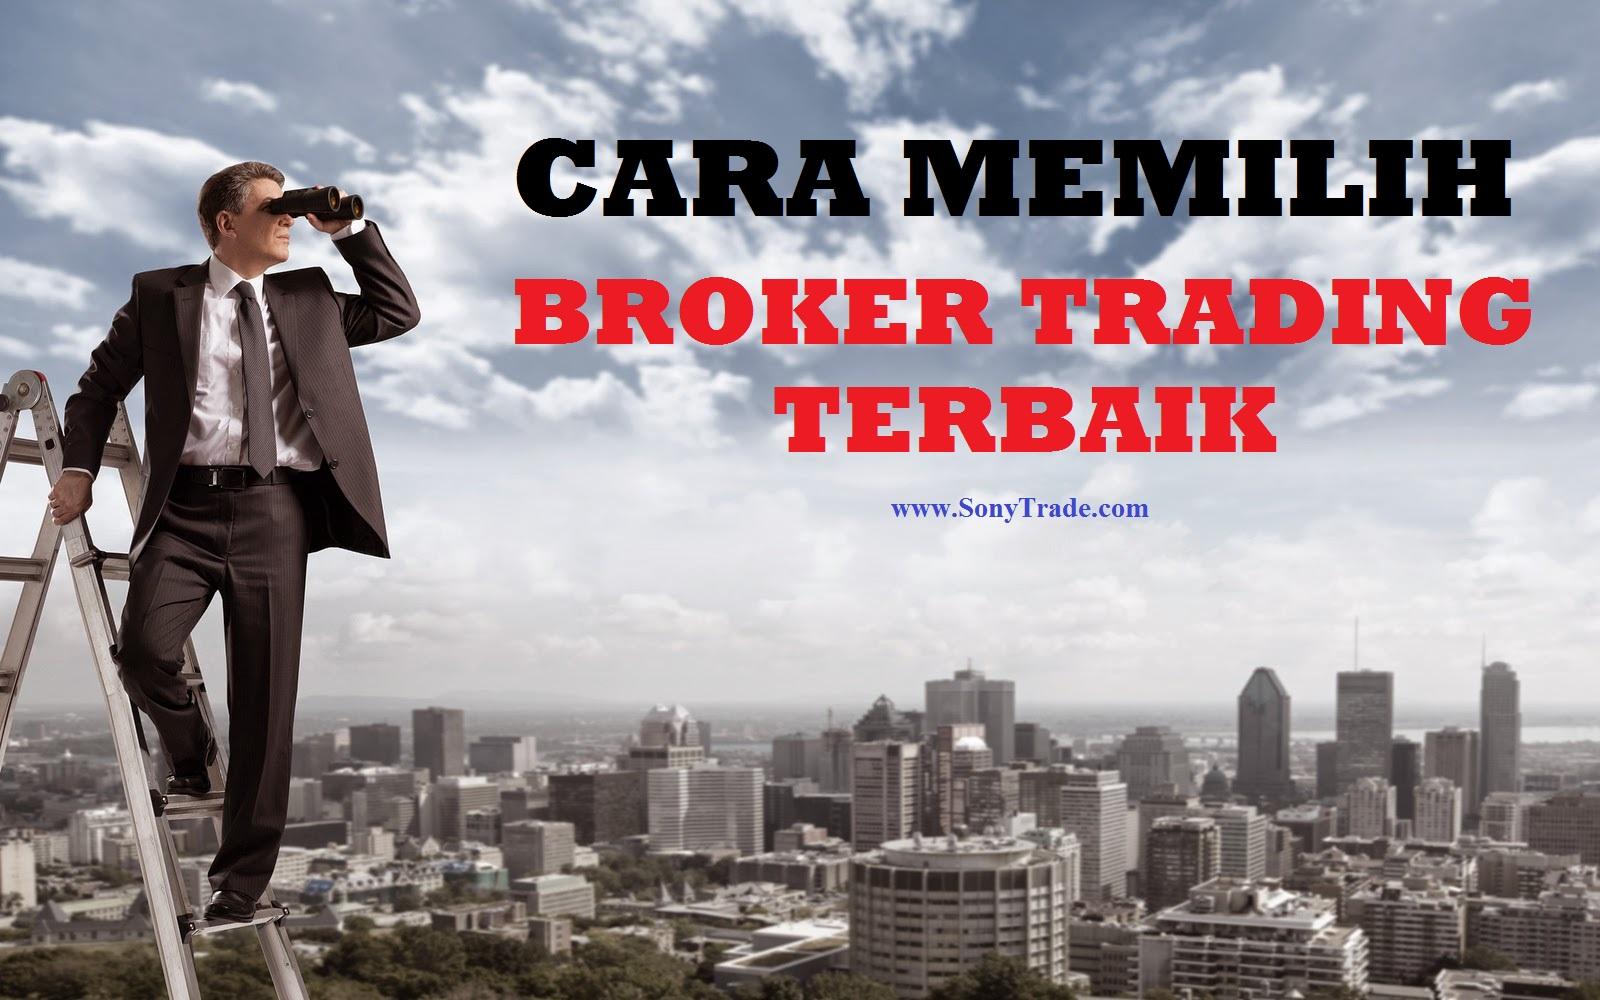 Broker trading option terbaik